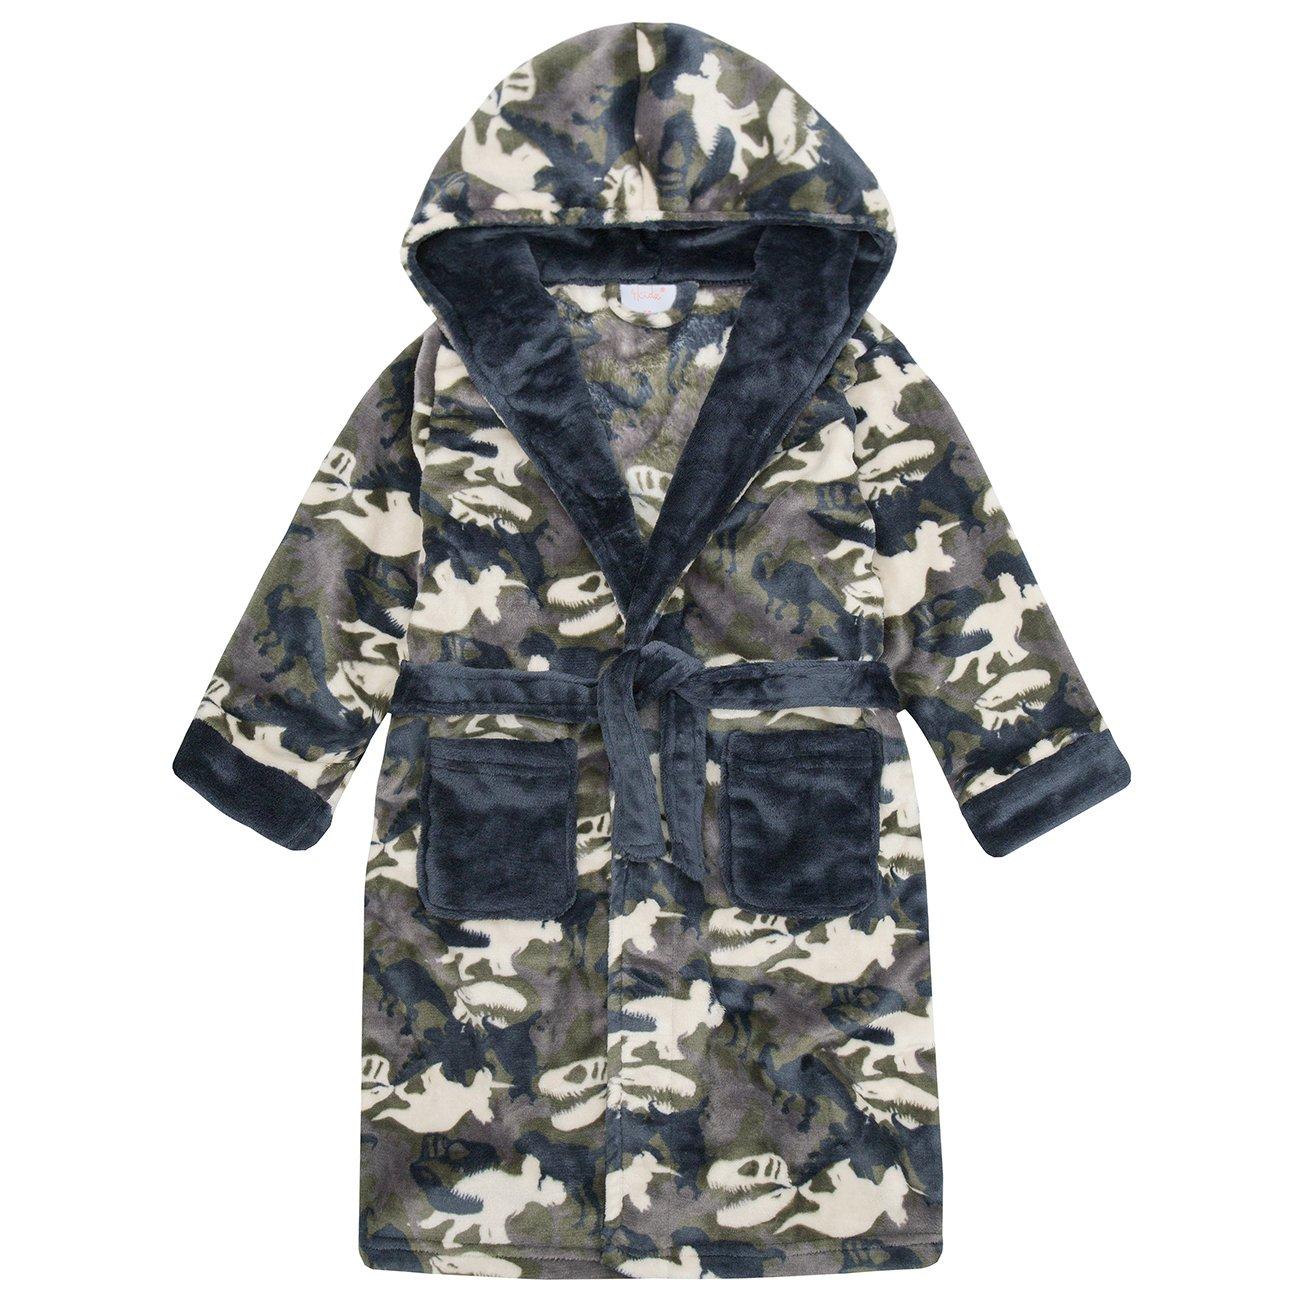 4Kidz Boys Novelty Dinosaur Camouflage Flannel Fleece Hooded Dressing Robe